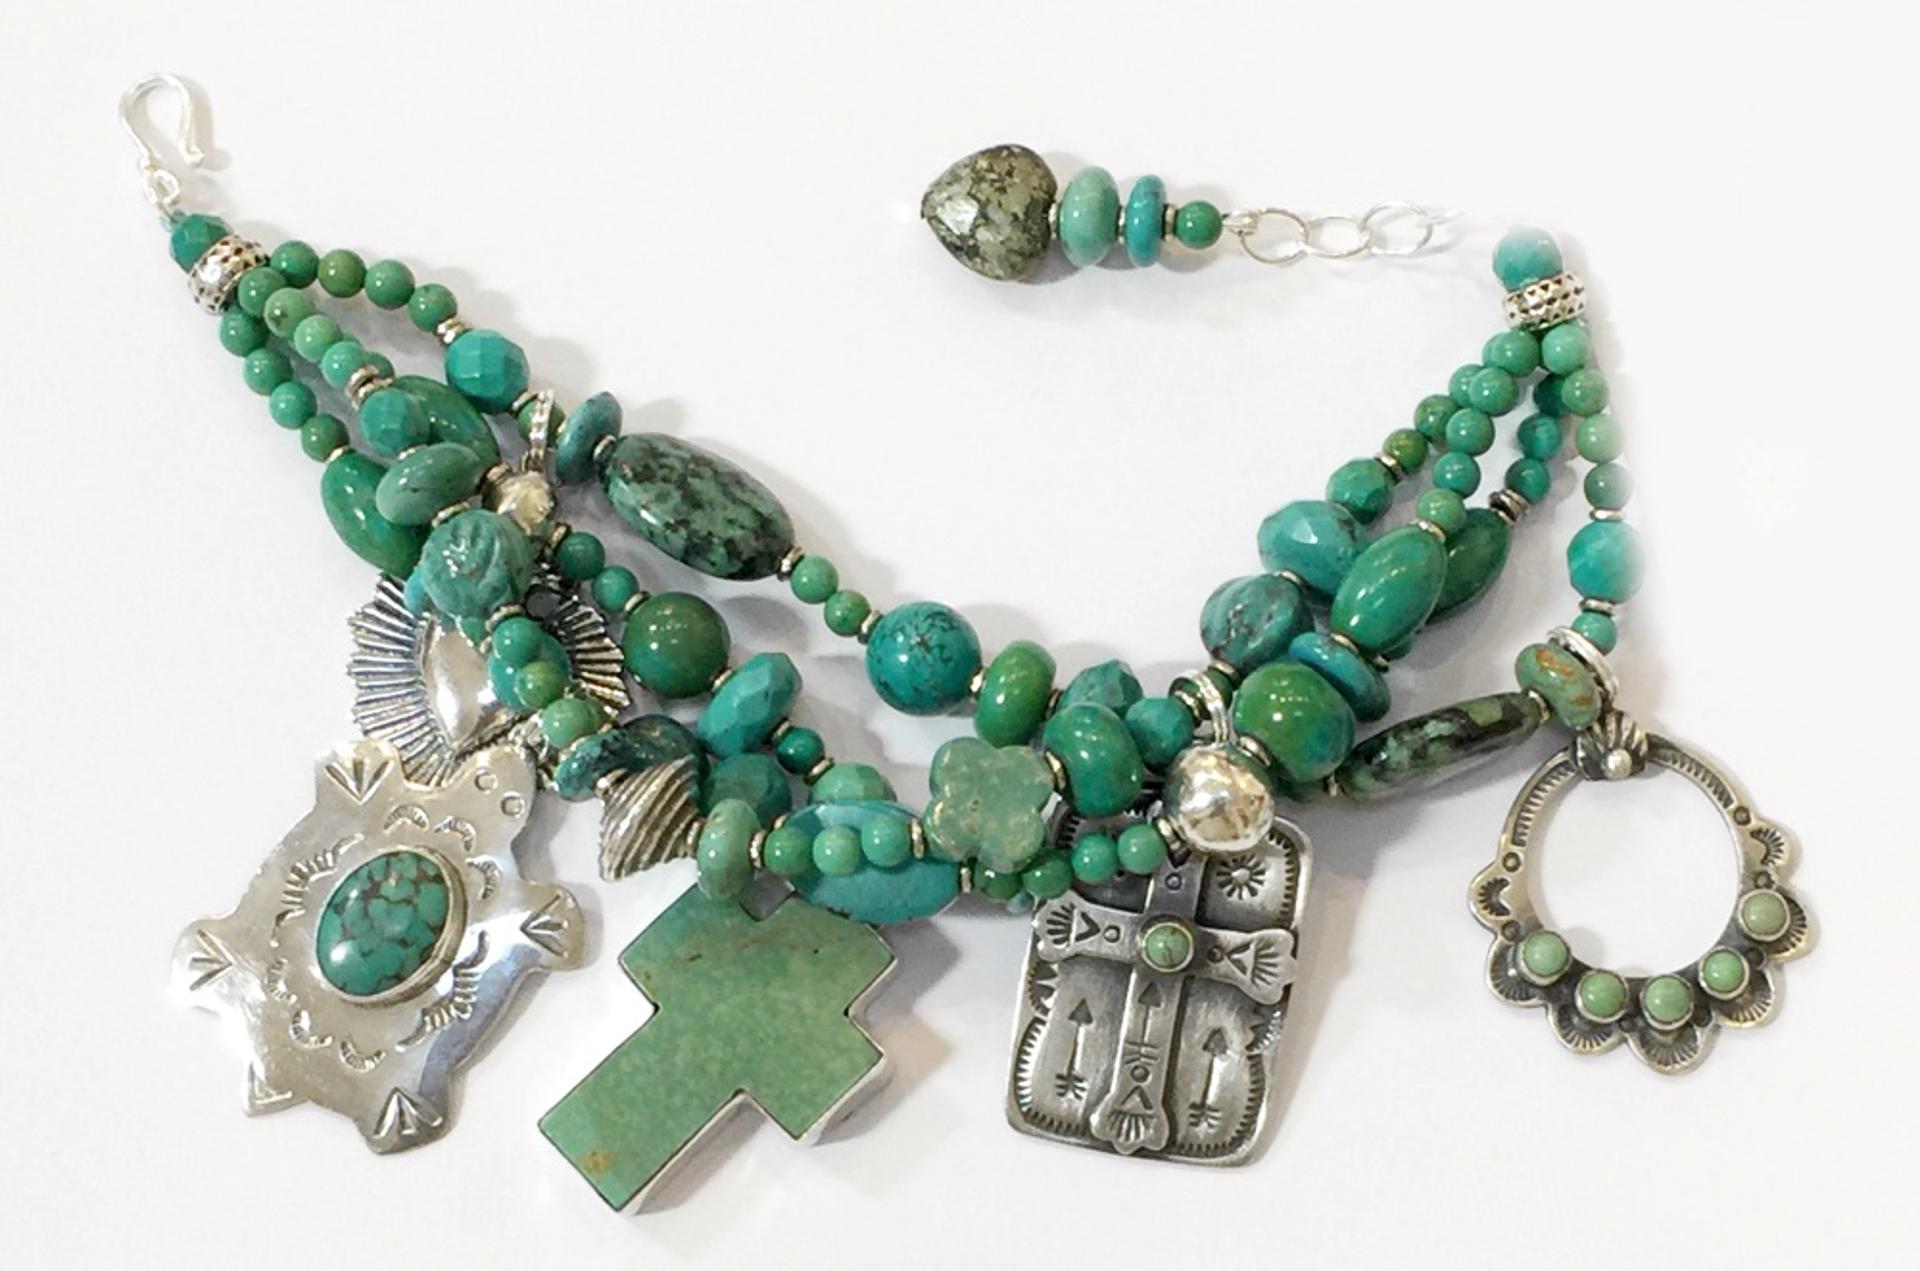 KY 1336 - Four Strand Turquoise Charm Bracelet by Kim Yubeta